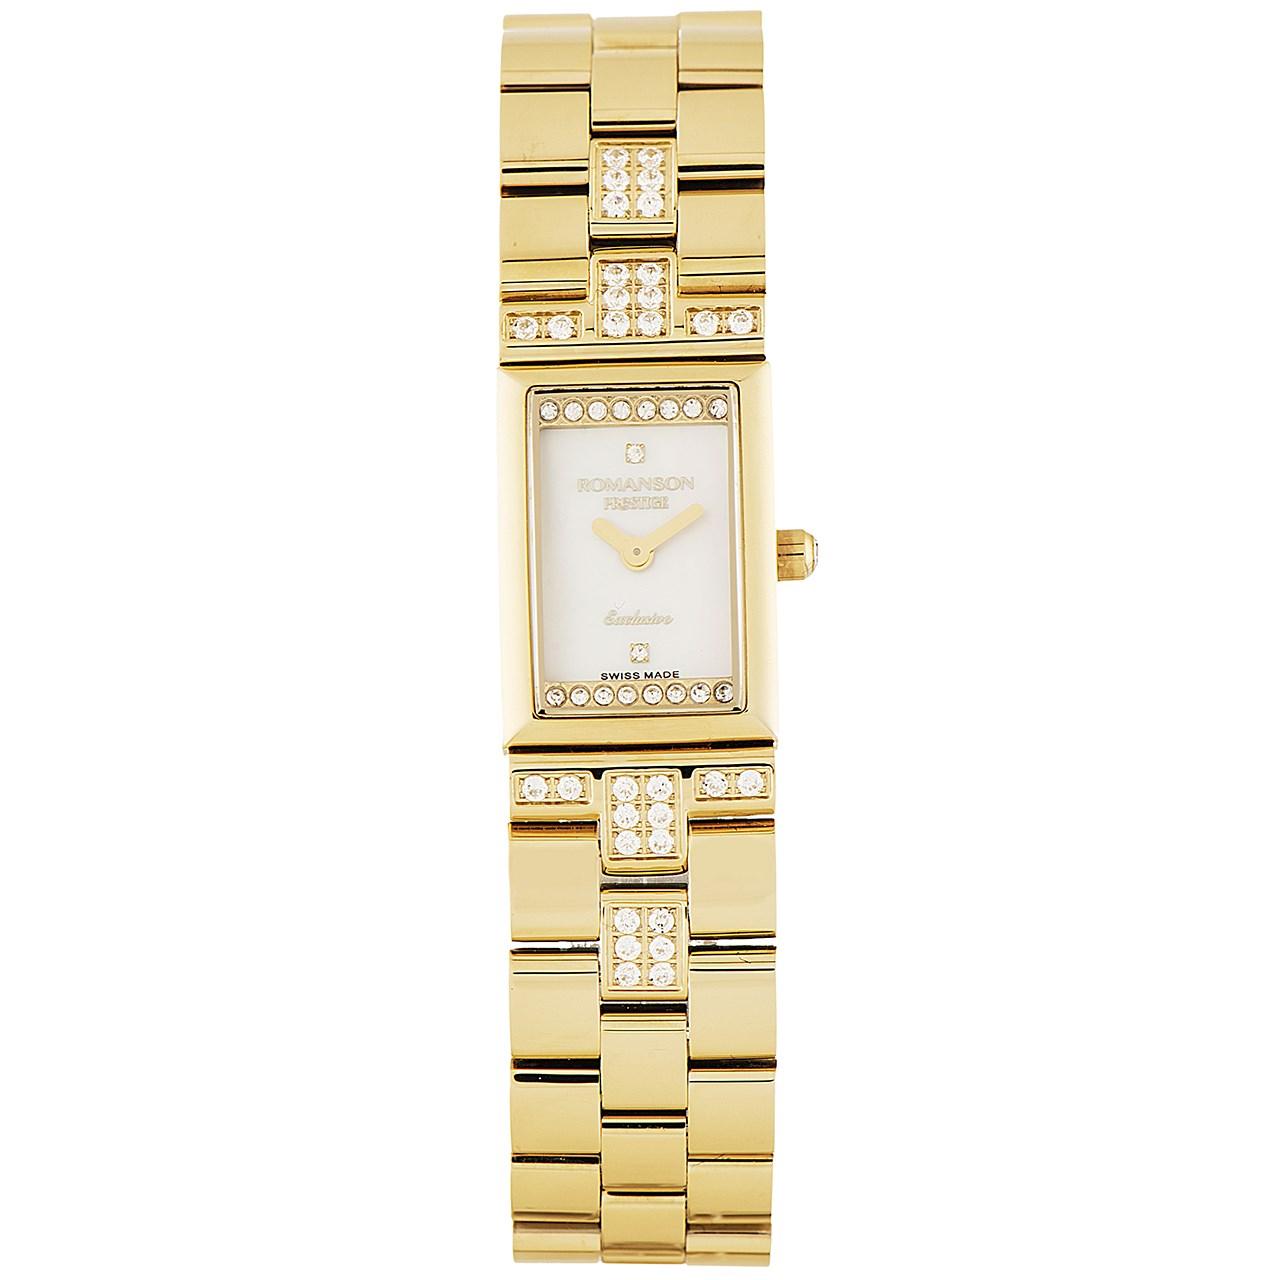 ساعت مچی عقربه ای زنانه رومانسون مدل RM3255CL1GM11G 28